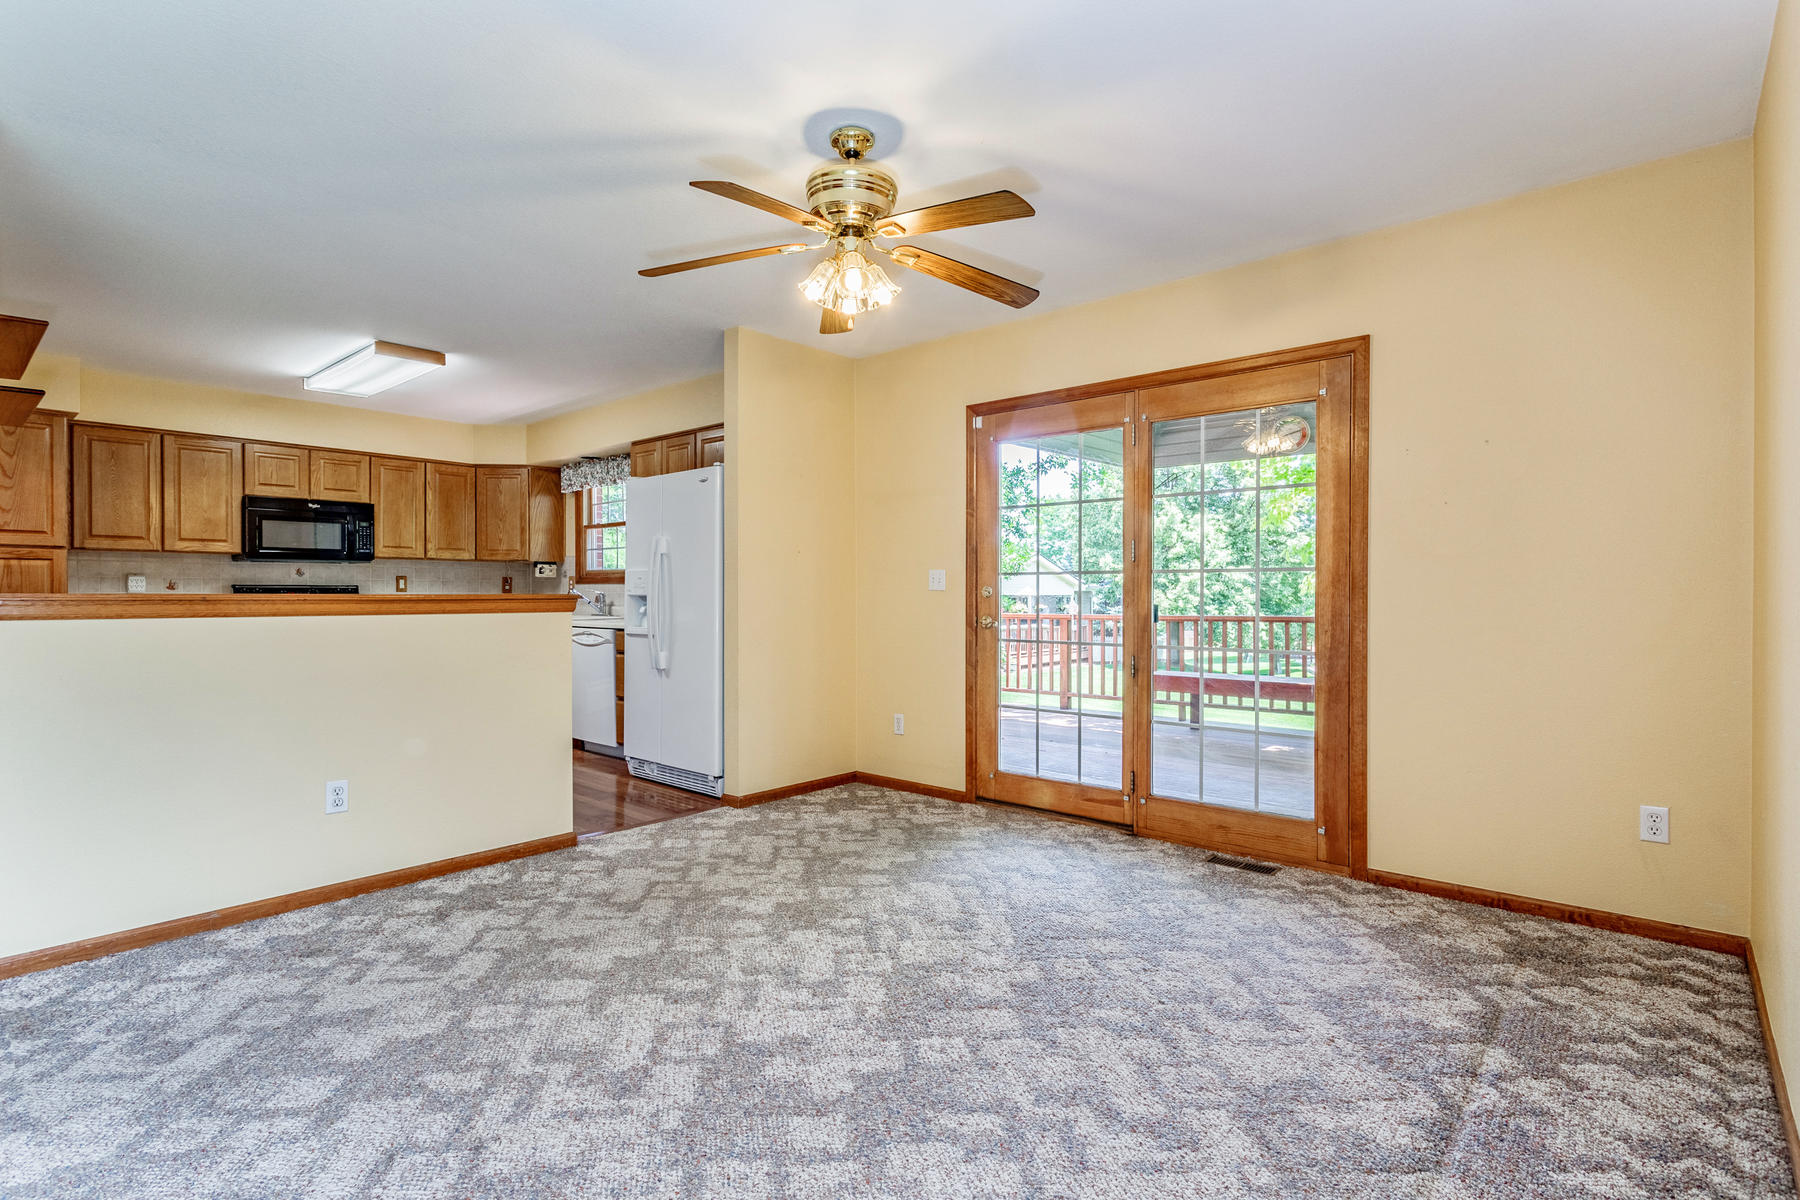 Room for a Full Formal Dining Room Set